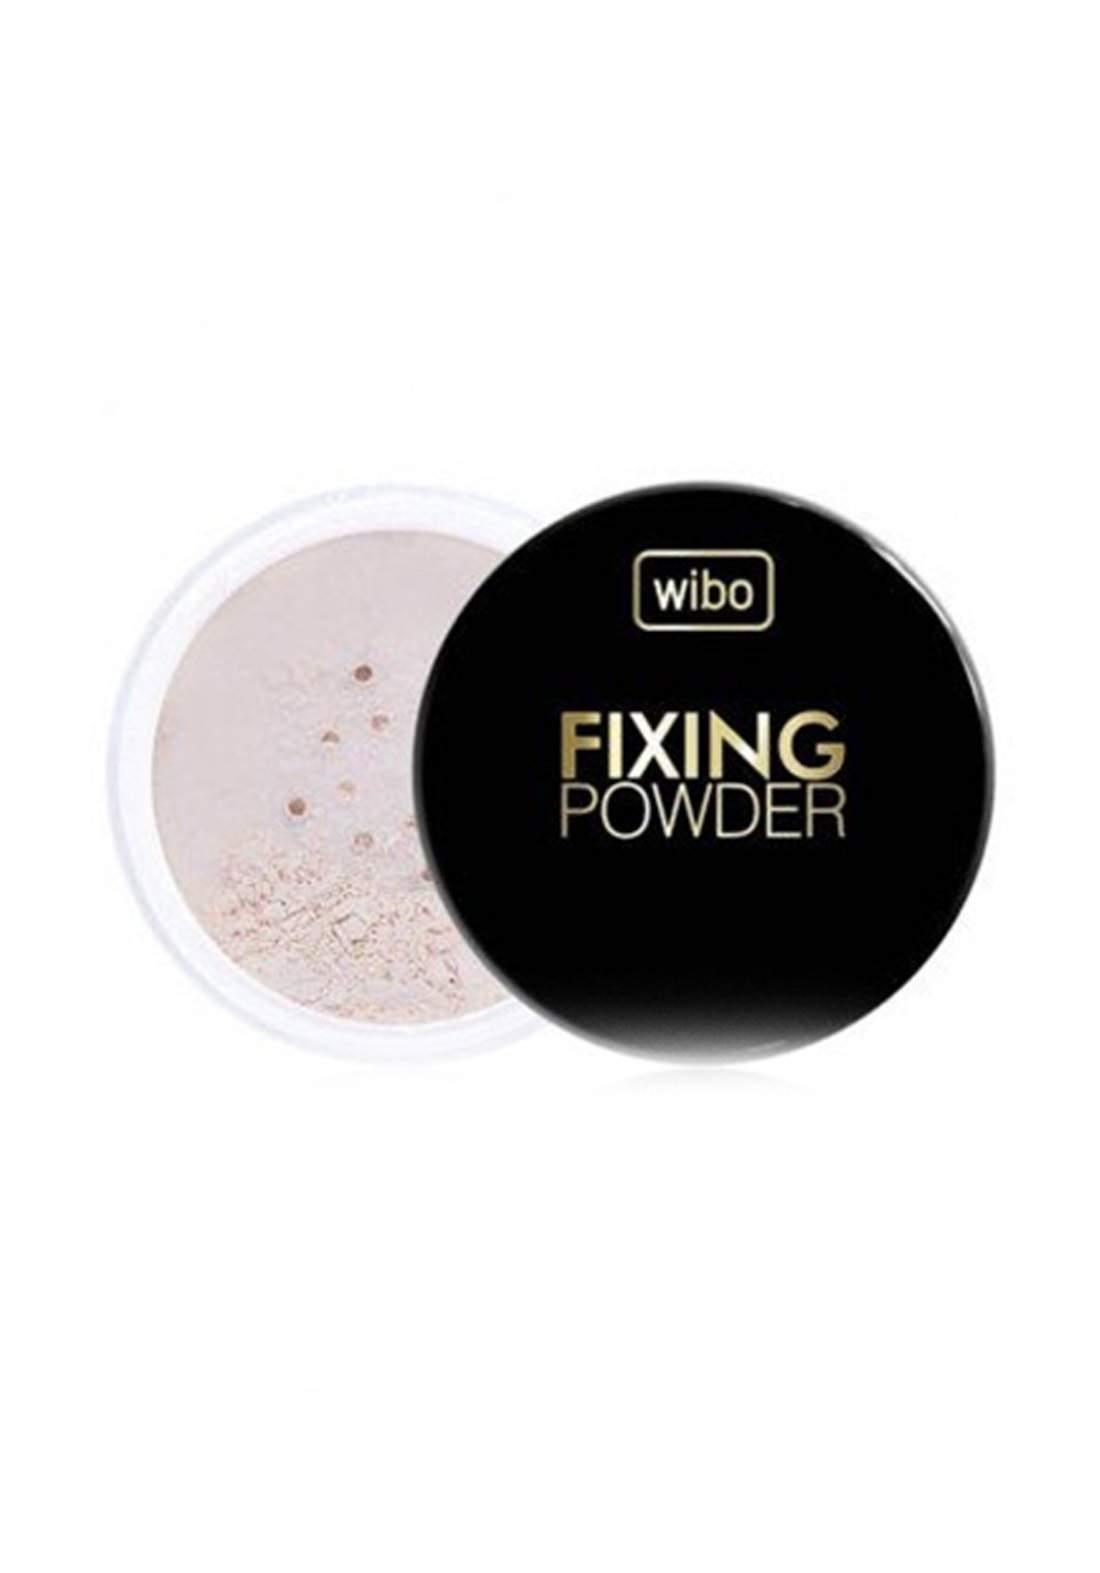 Wibo Fixing Powder بودرة